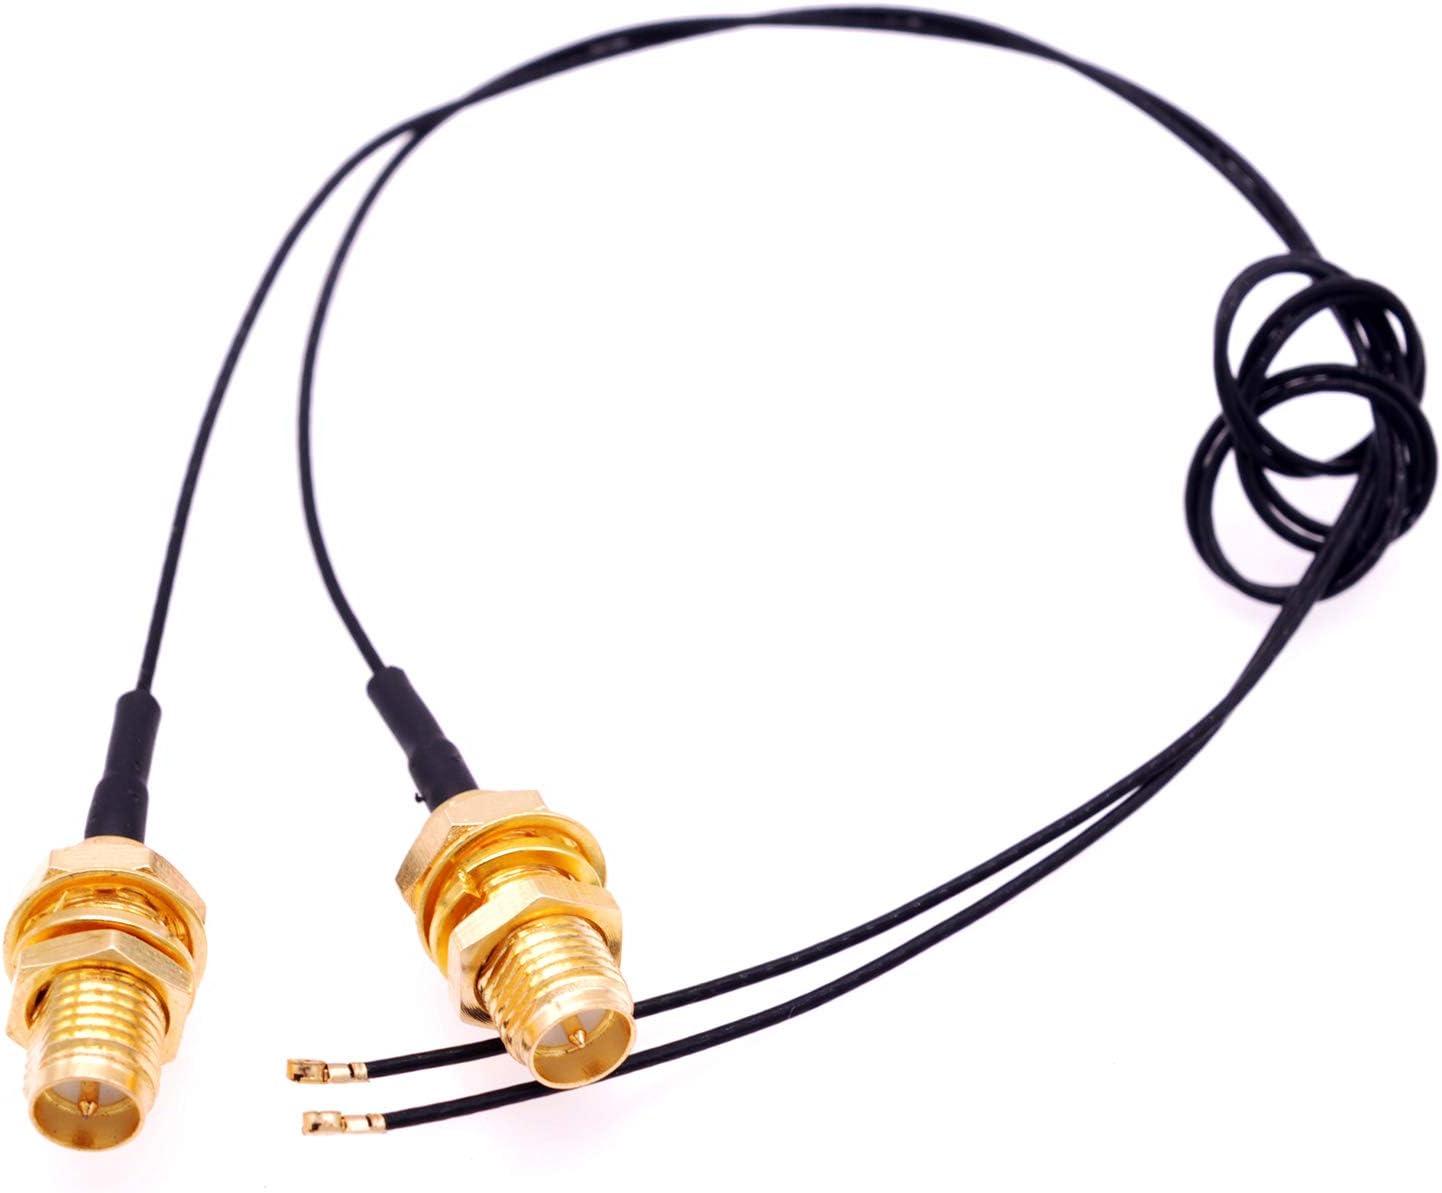 Deal4GO Max 73% OFF 2Pcs 19cm Super beauty product restock quality top! U.FL iPX4 to Connector RP-SMA SMA Fem Antenna